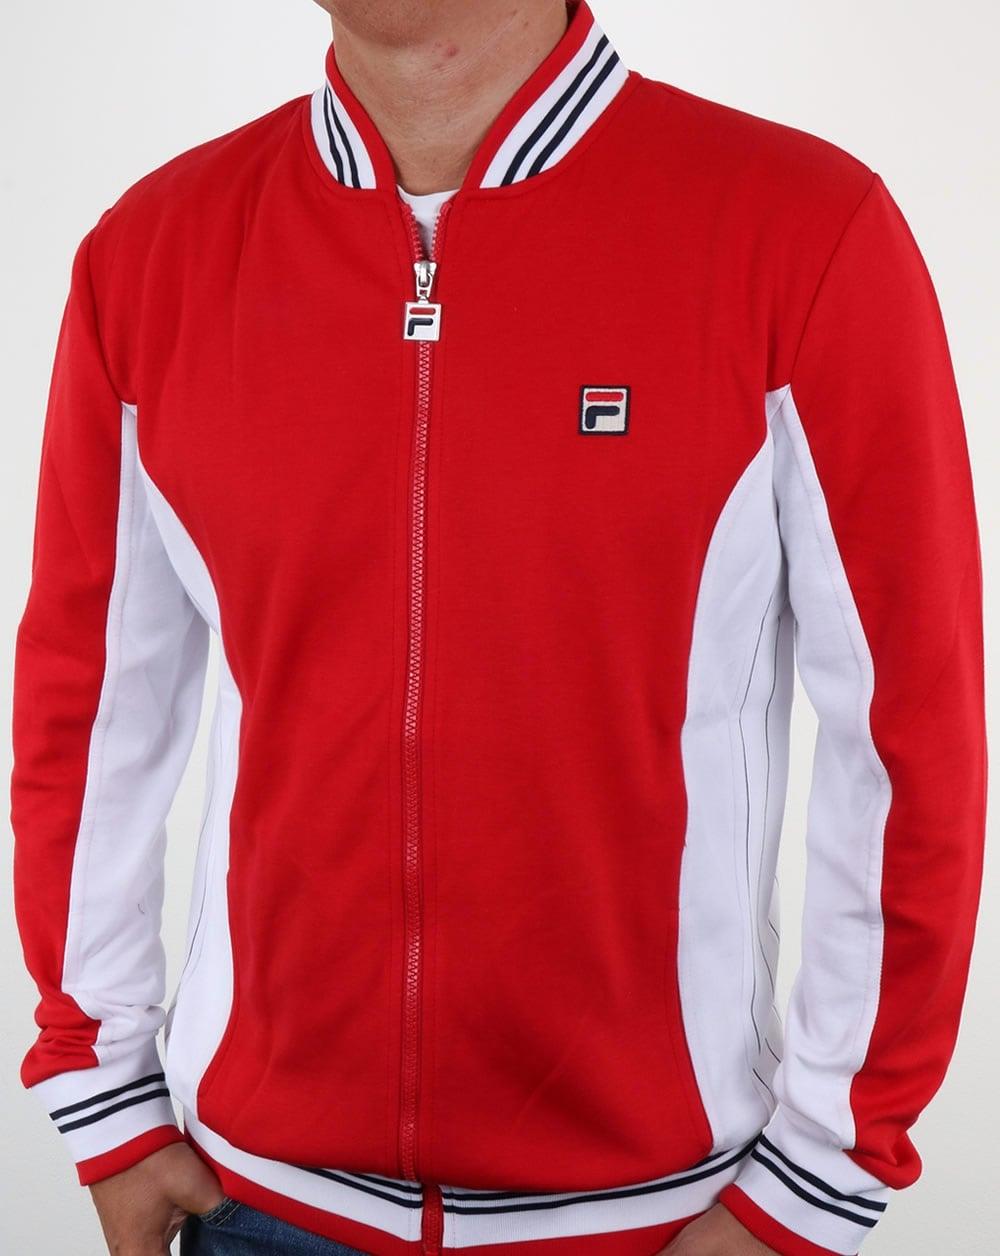 Track Top Red,mk1,jacket,borg,bj,tracksuit